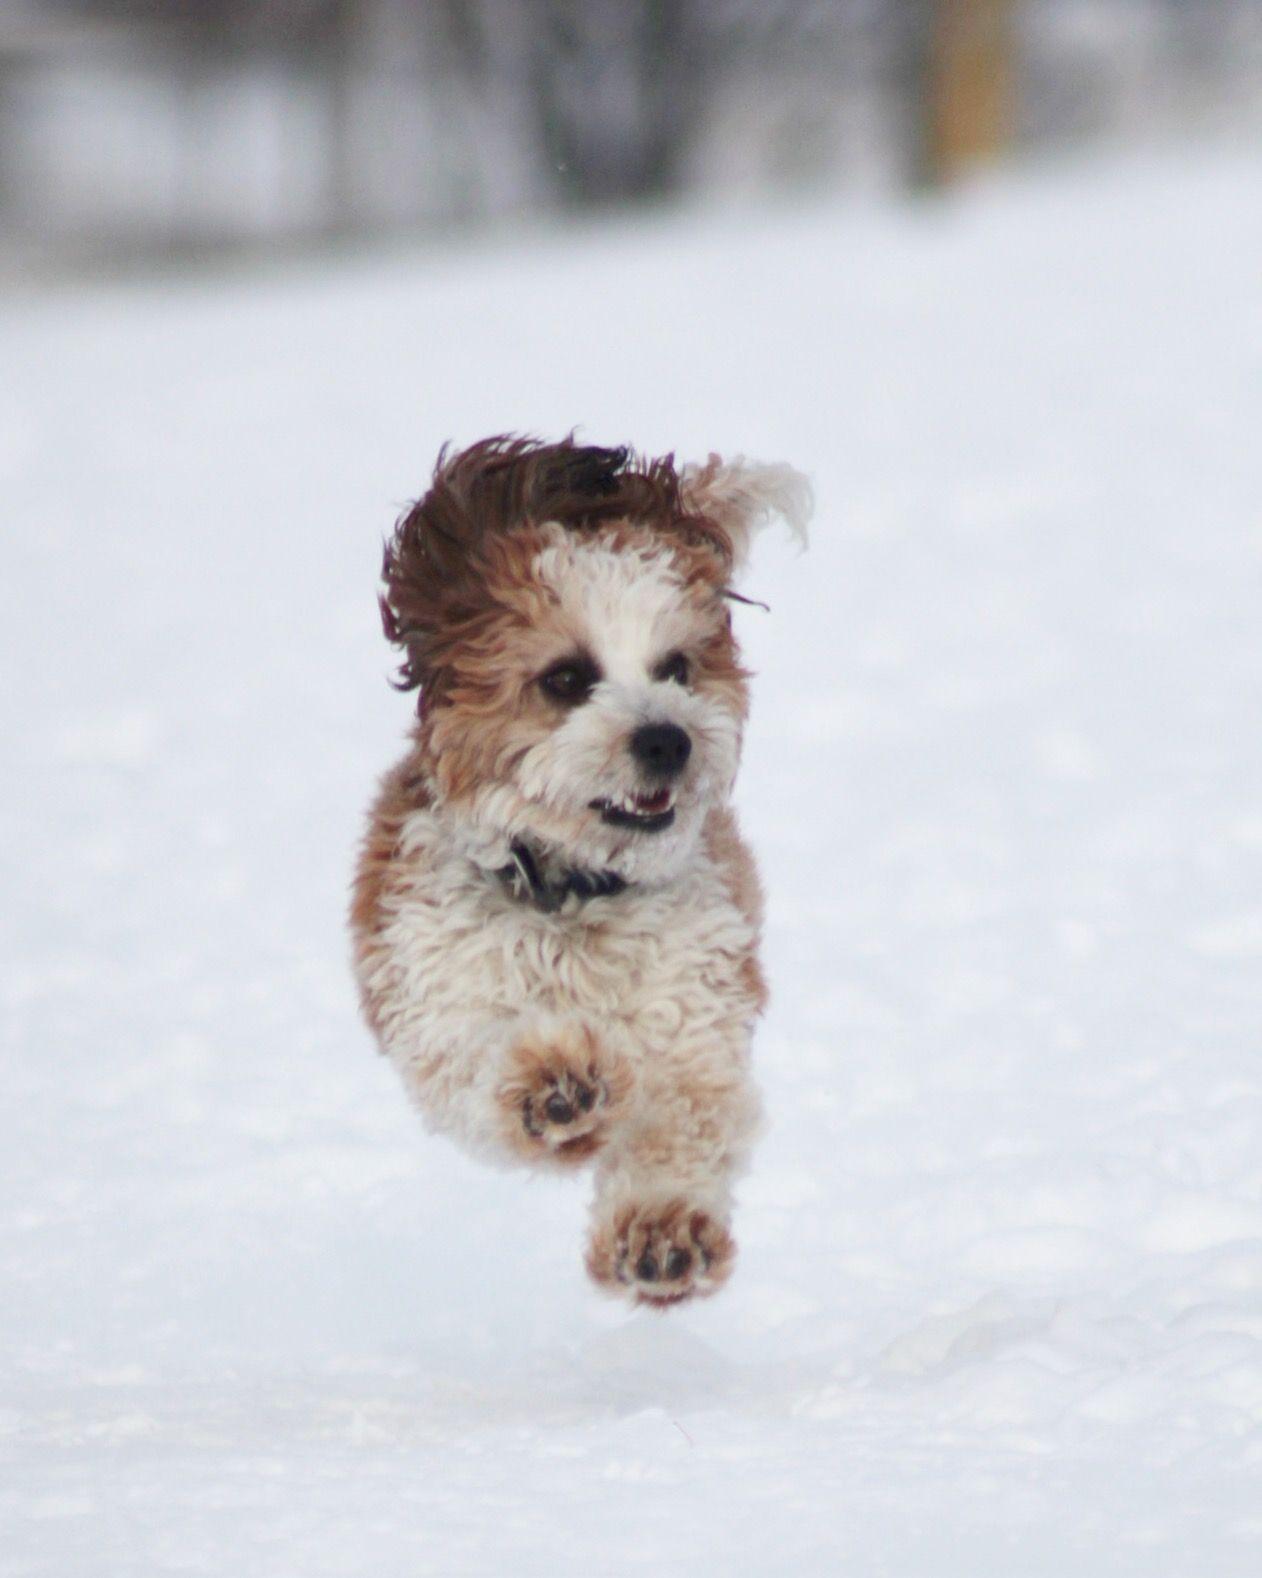 Shichon Snow Fun Zuchon Bichon Shih Tzu Puppies Hunde